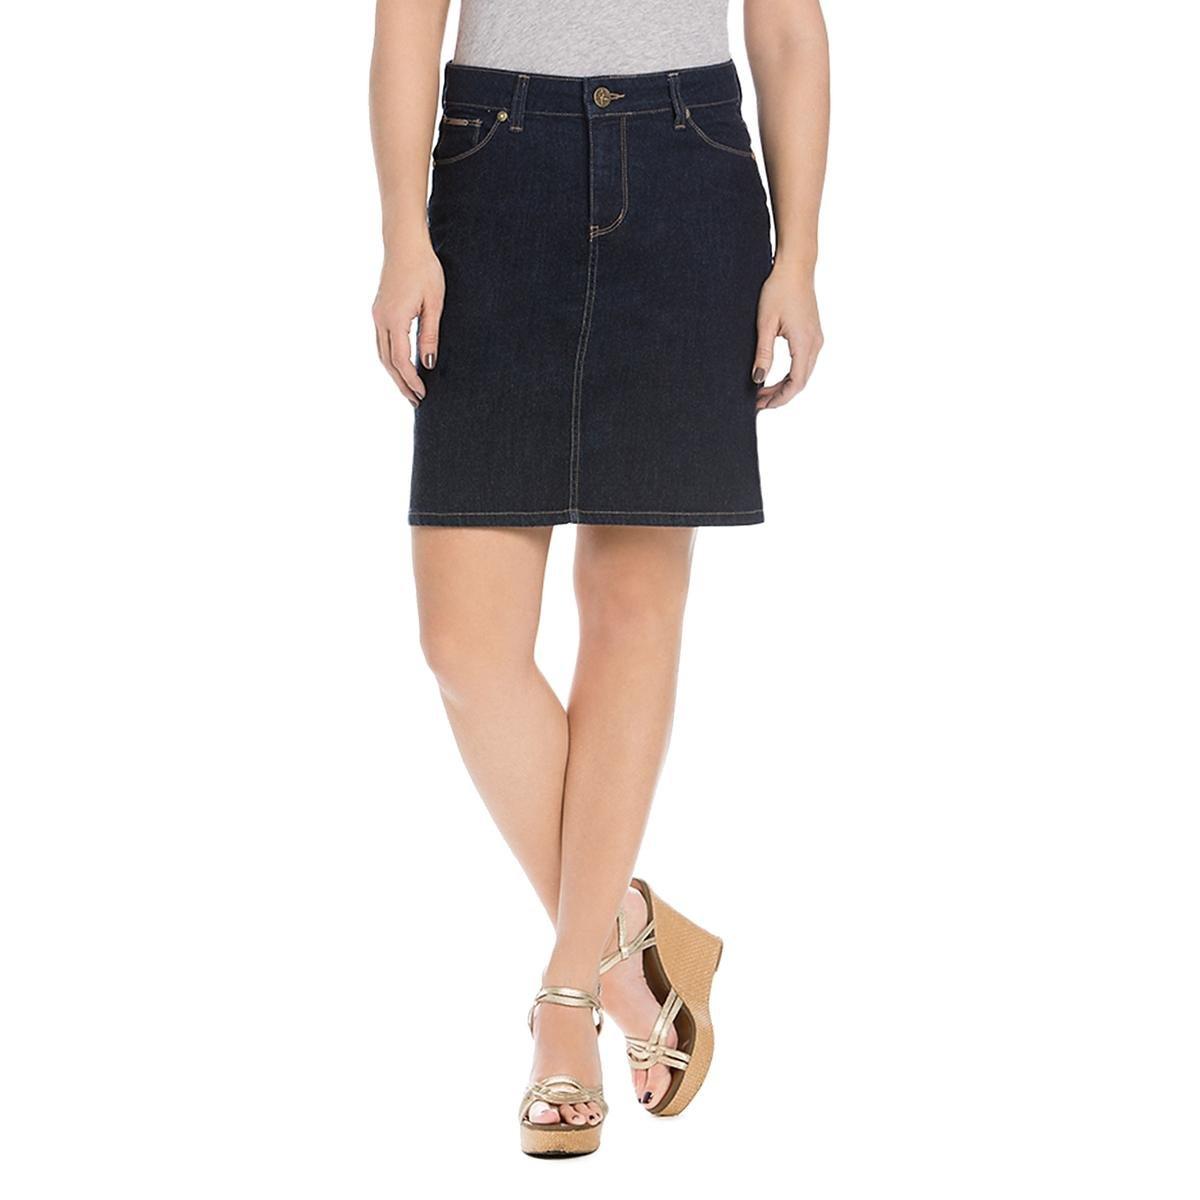 Beija Flor Womens Mini Curve Friendly Denim Skirt Blue 6